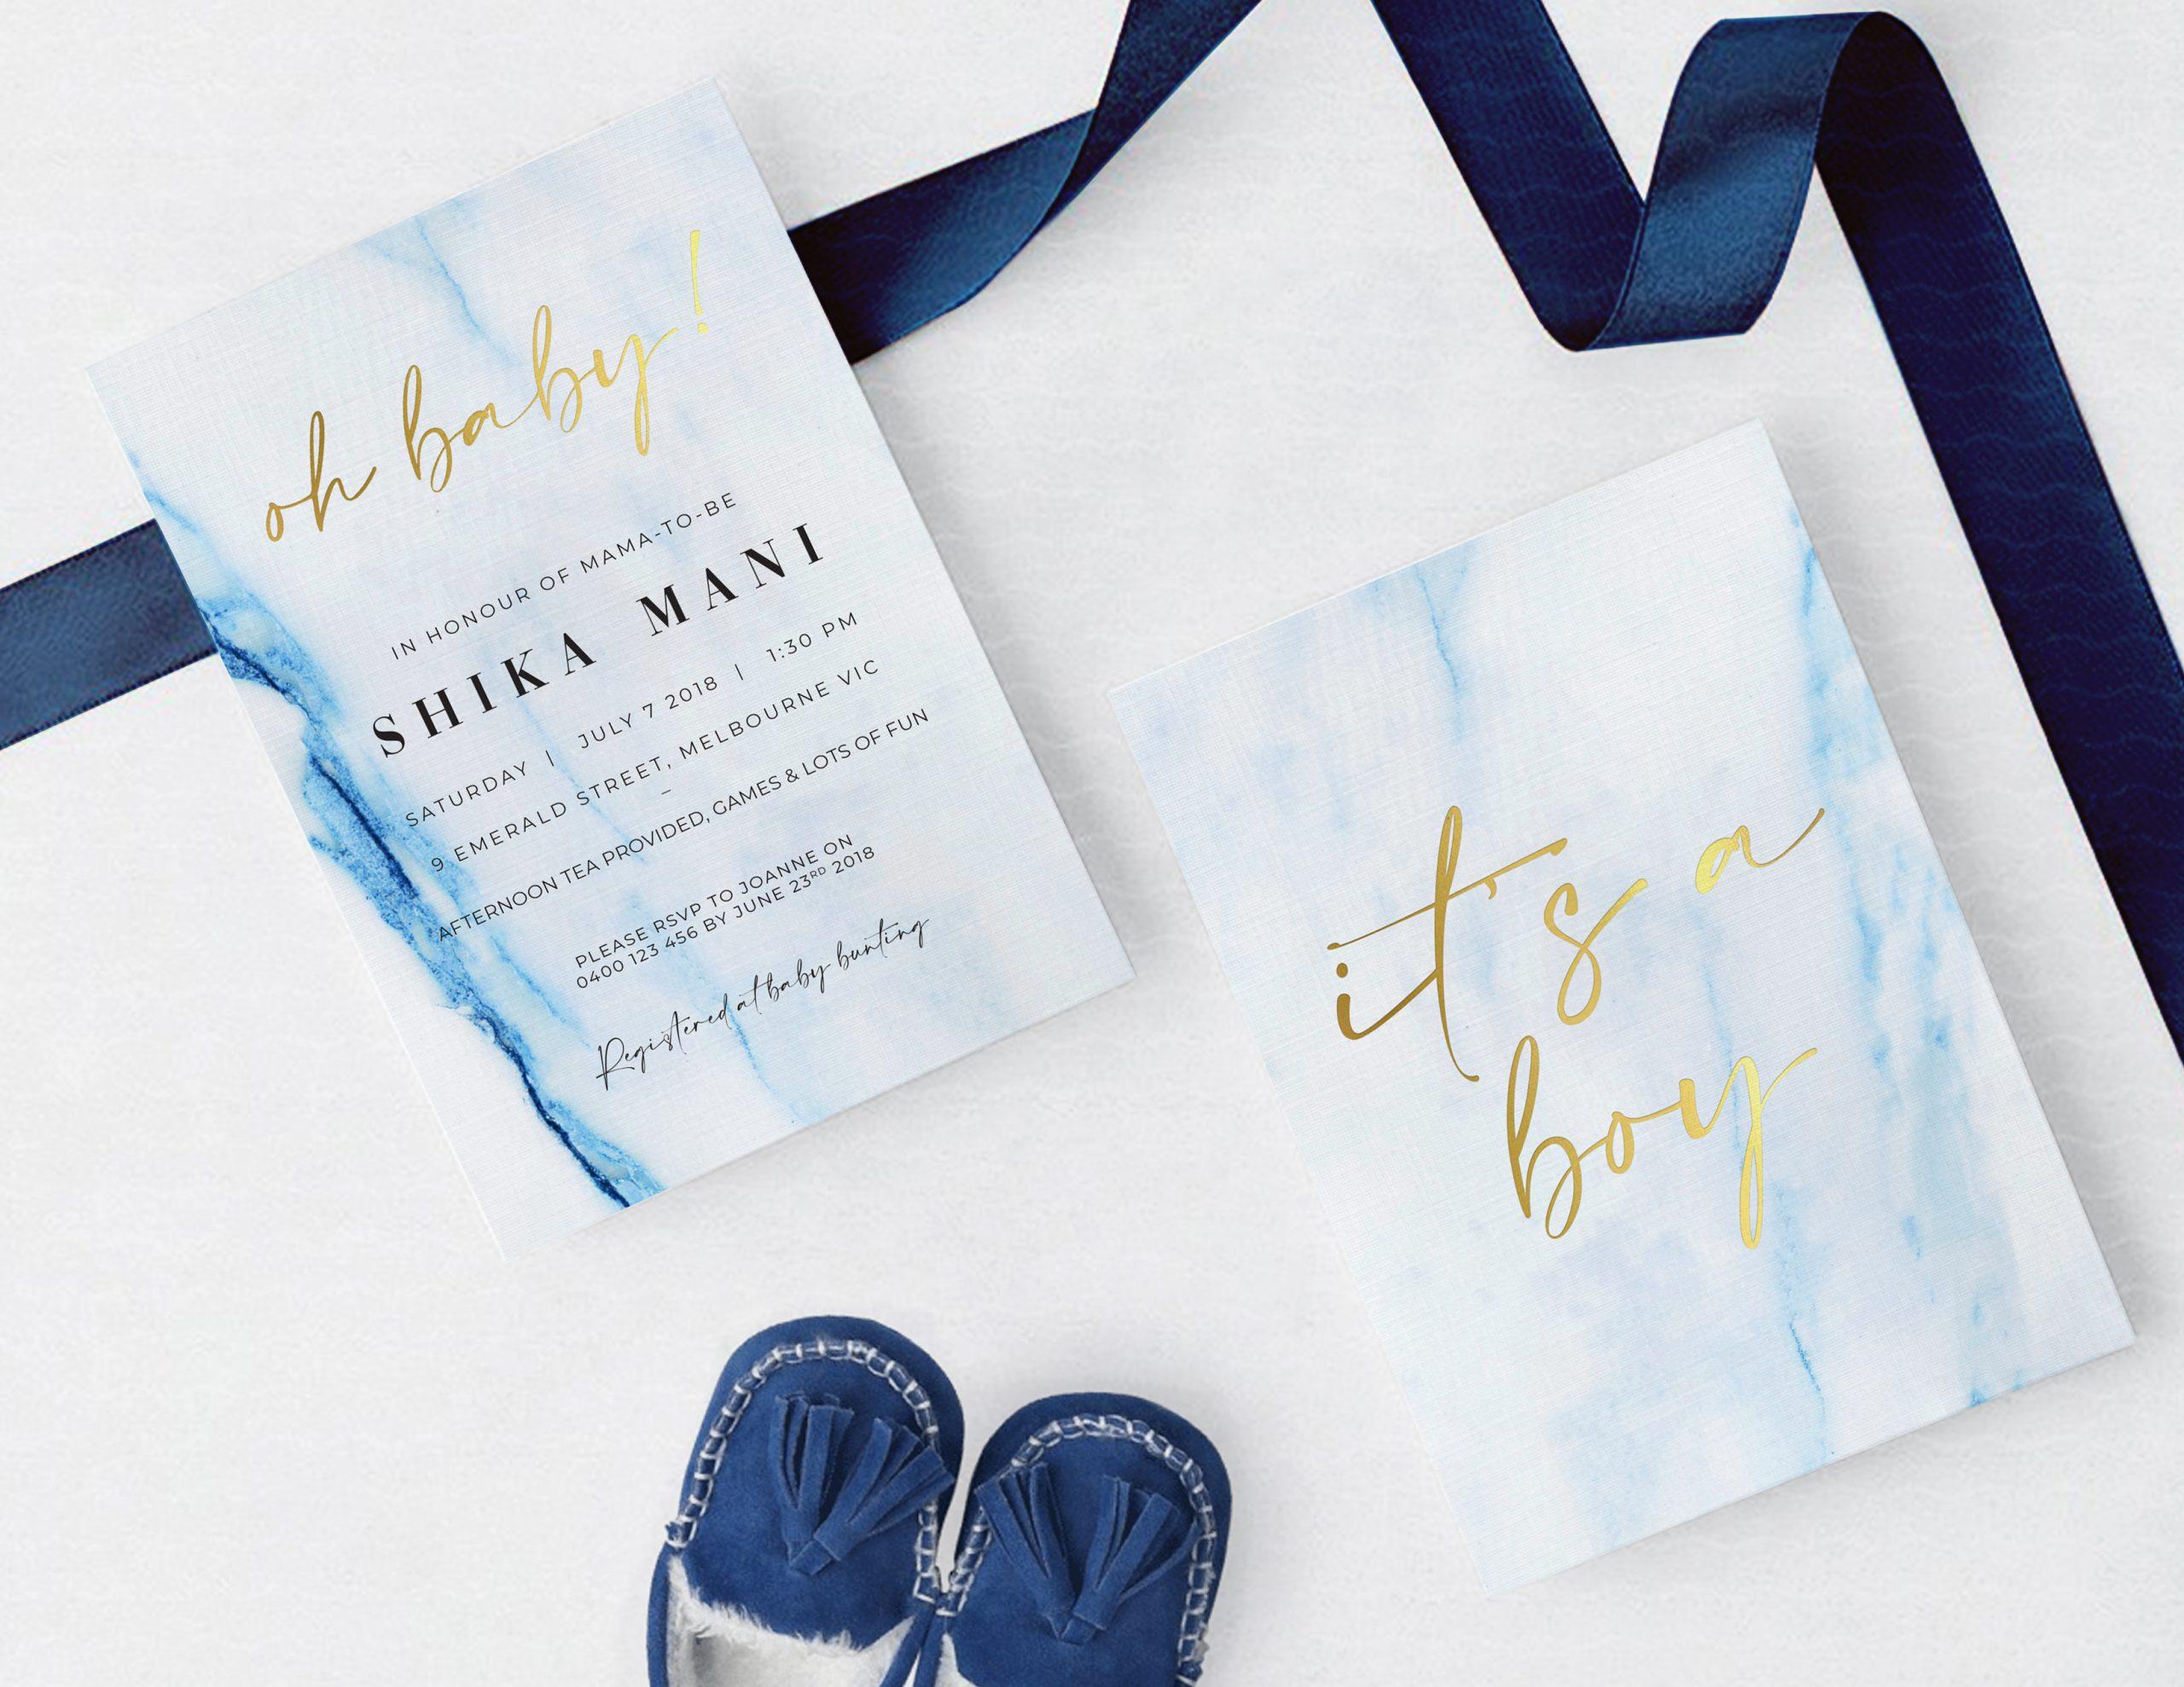 Natalie Pasnin Designs - Blue Marble, with Gold Foil Baby Shower Invitation Card